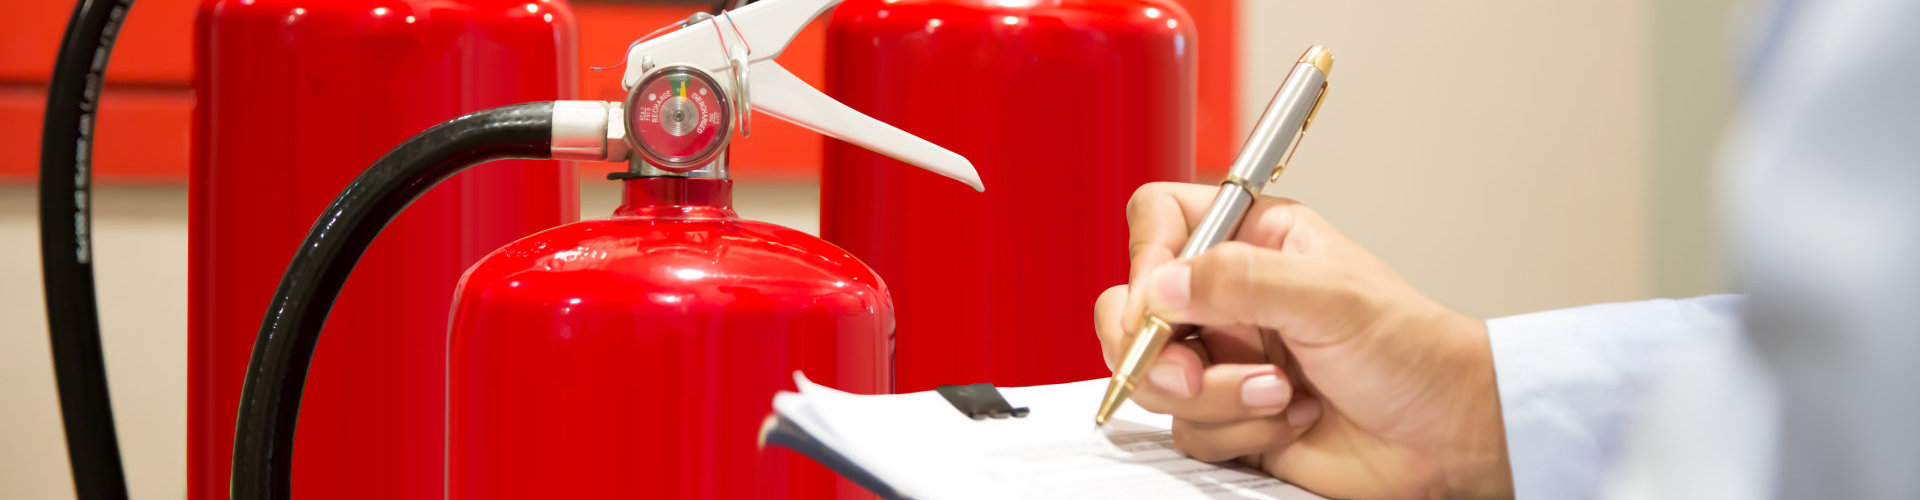 Engineer inspection Pressure gauge of Fire extinguisher.